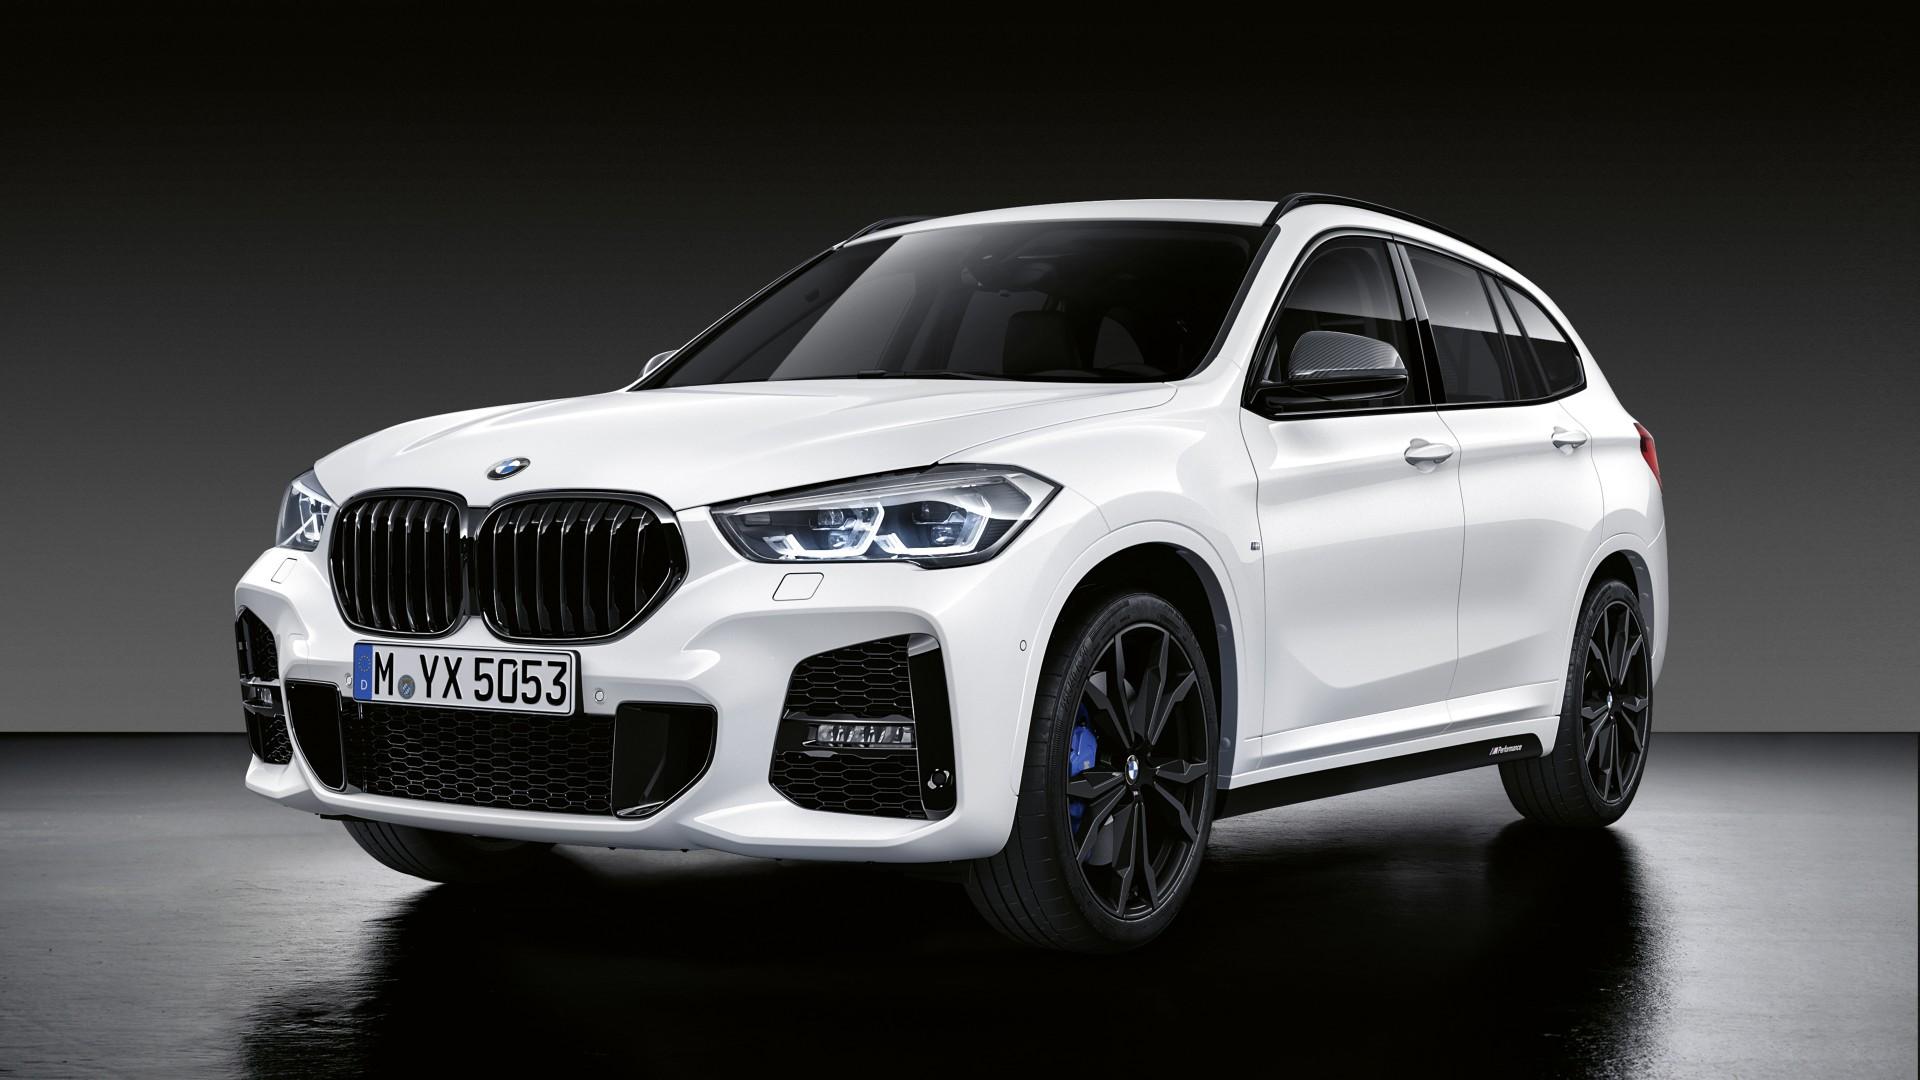 BMW X1 M Performance Parts 2019 4K Wallpaper | HD Car ...